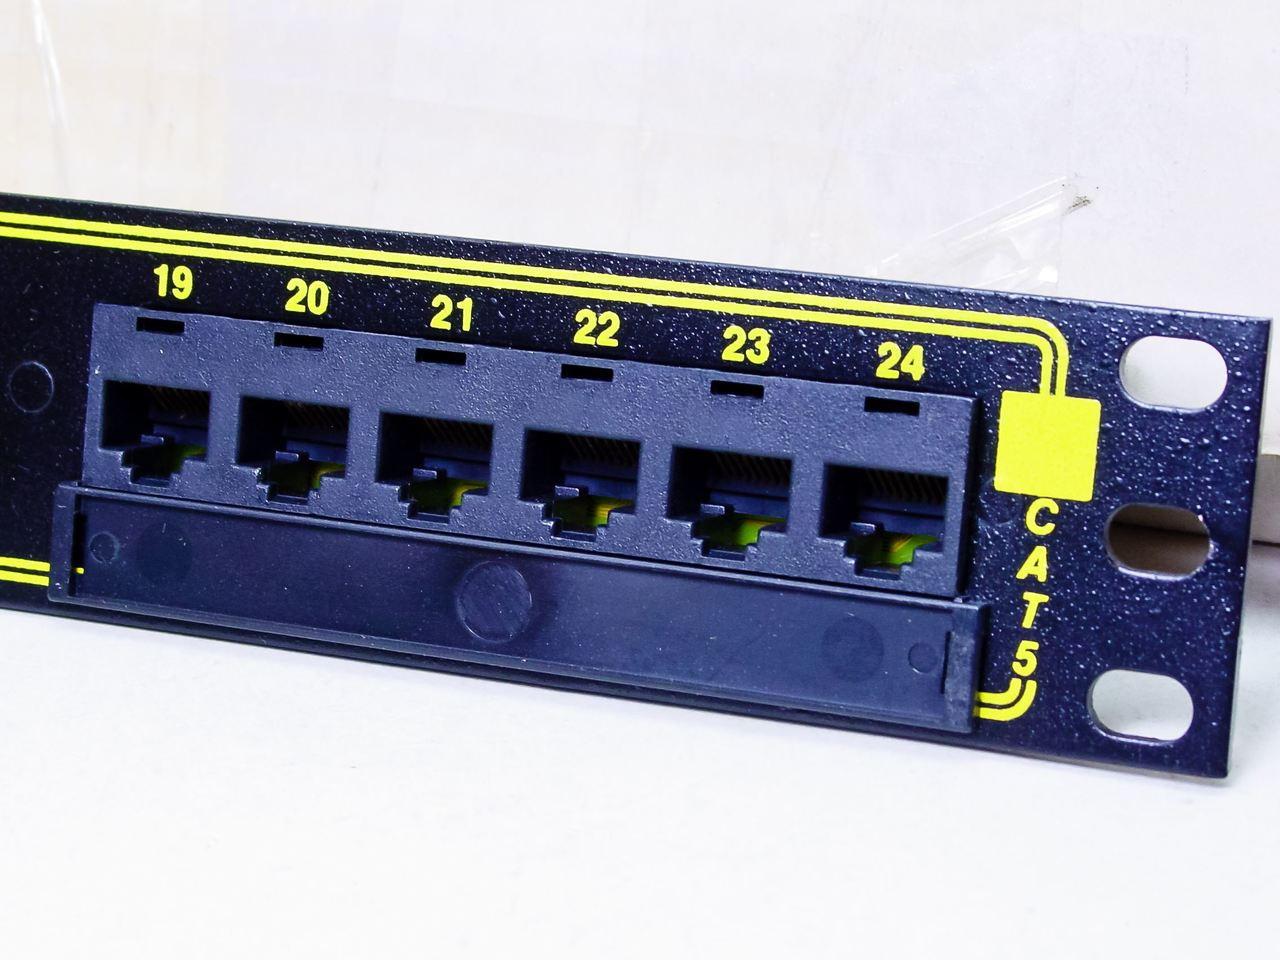 priced Pack Ortronics Spc5e15-08 - Cbl Assy Mod 24-4pr Stranded Cat5e T568a//b 15ft Gray Techchoice 1pk=10ea